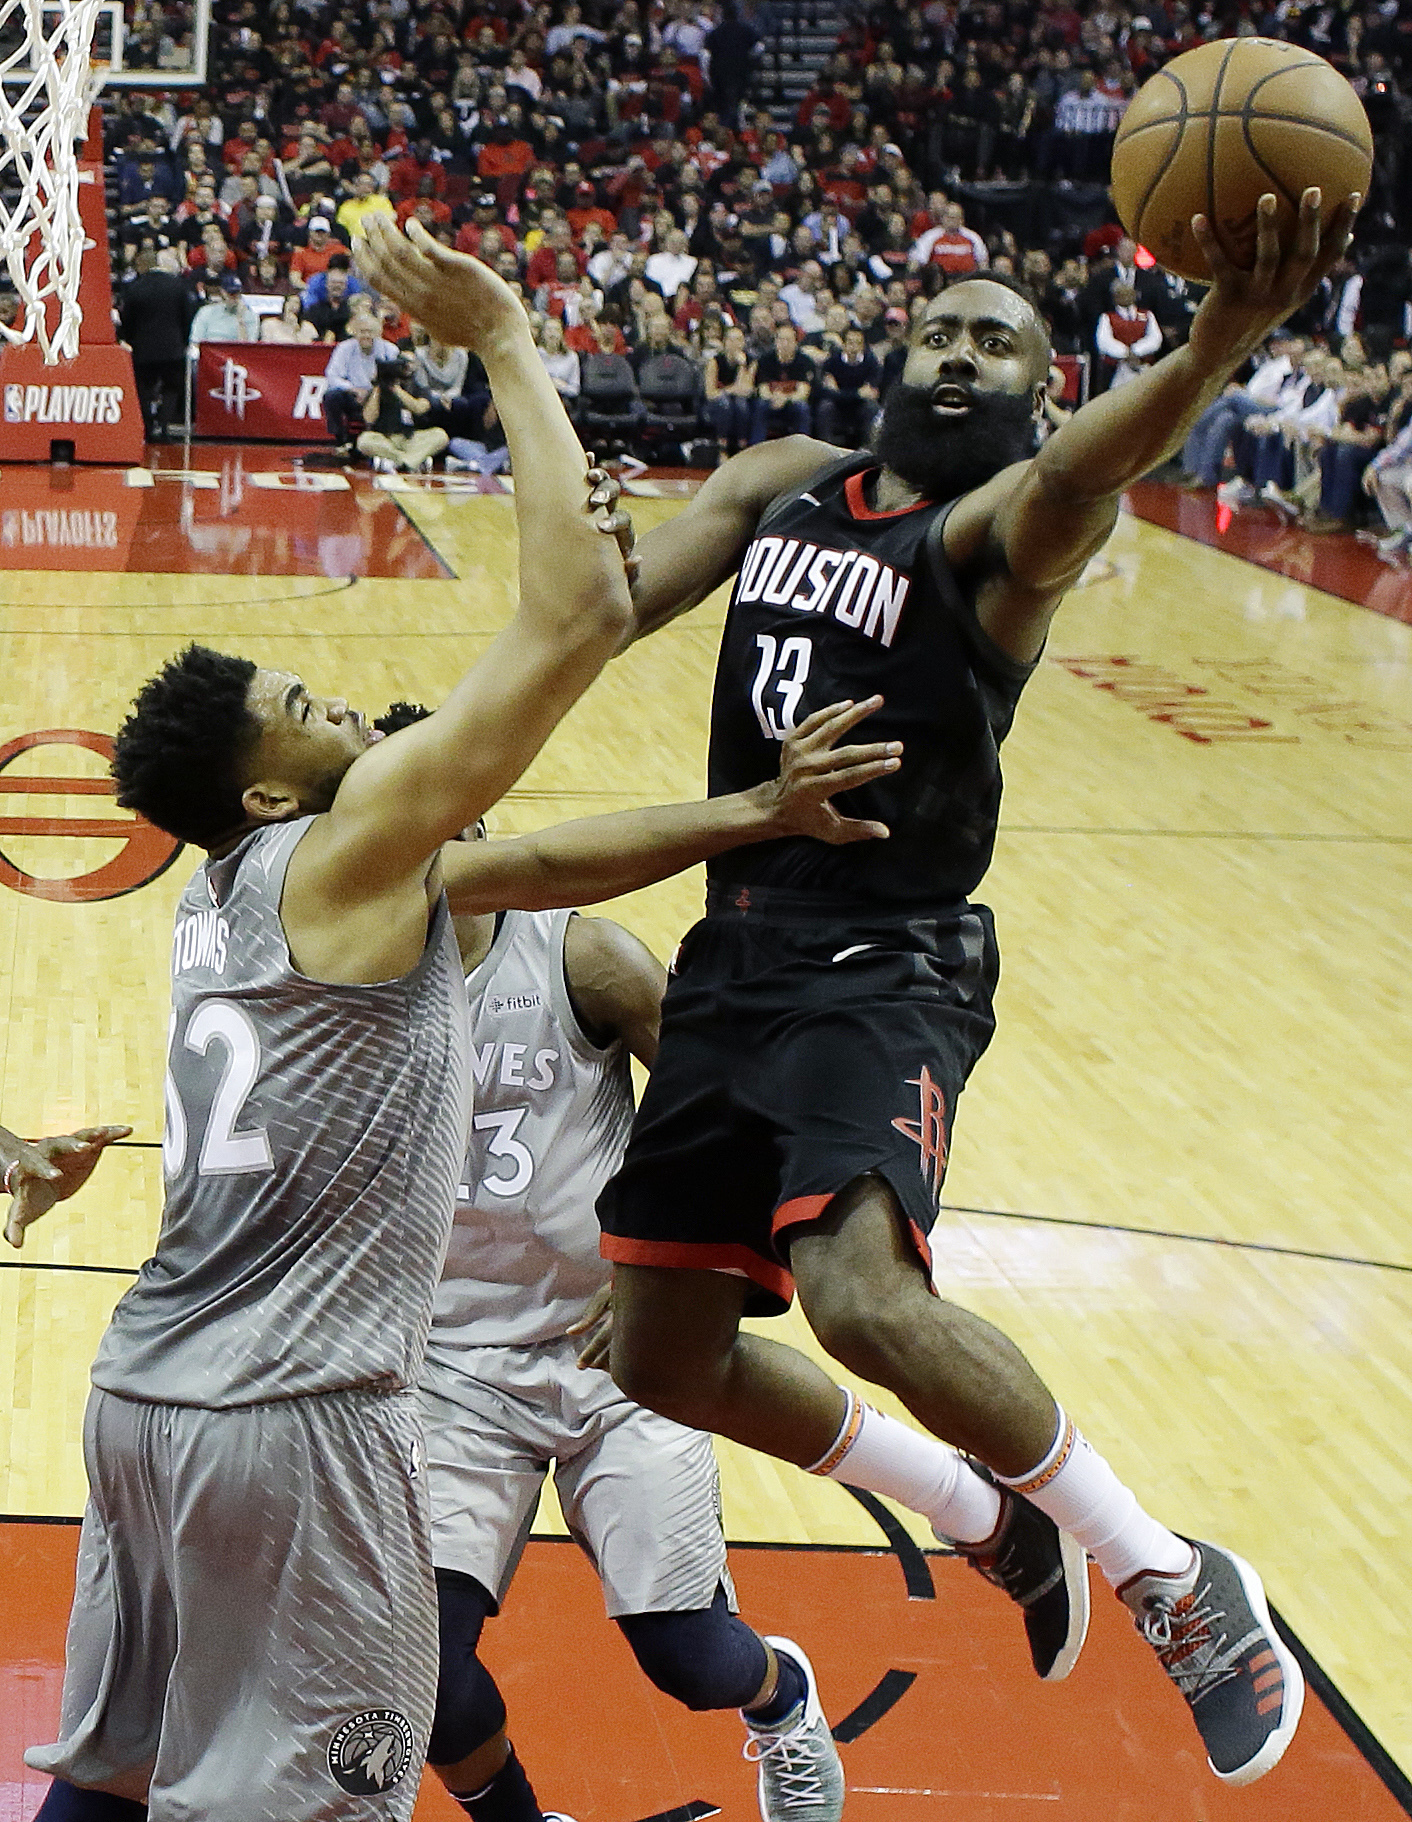 Timberwolves Rockets Basketball_1523852352017